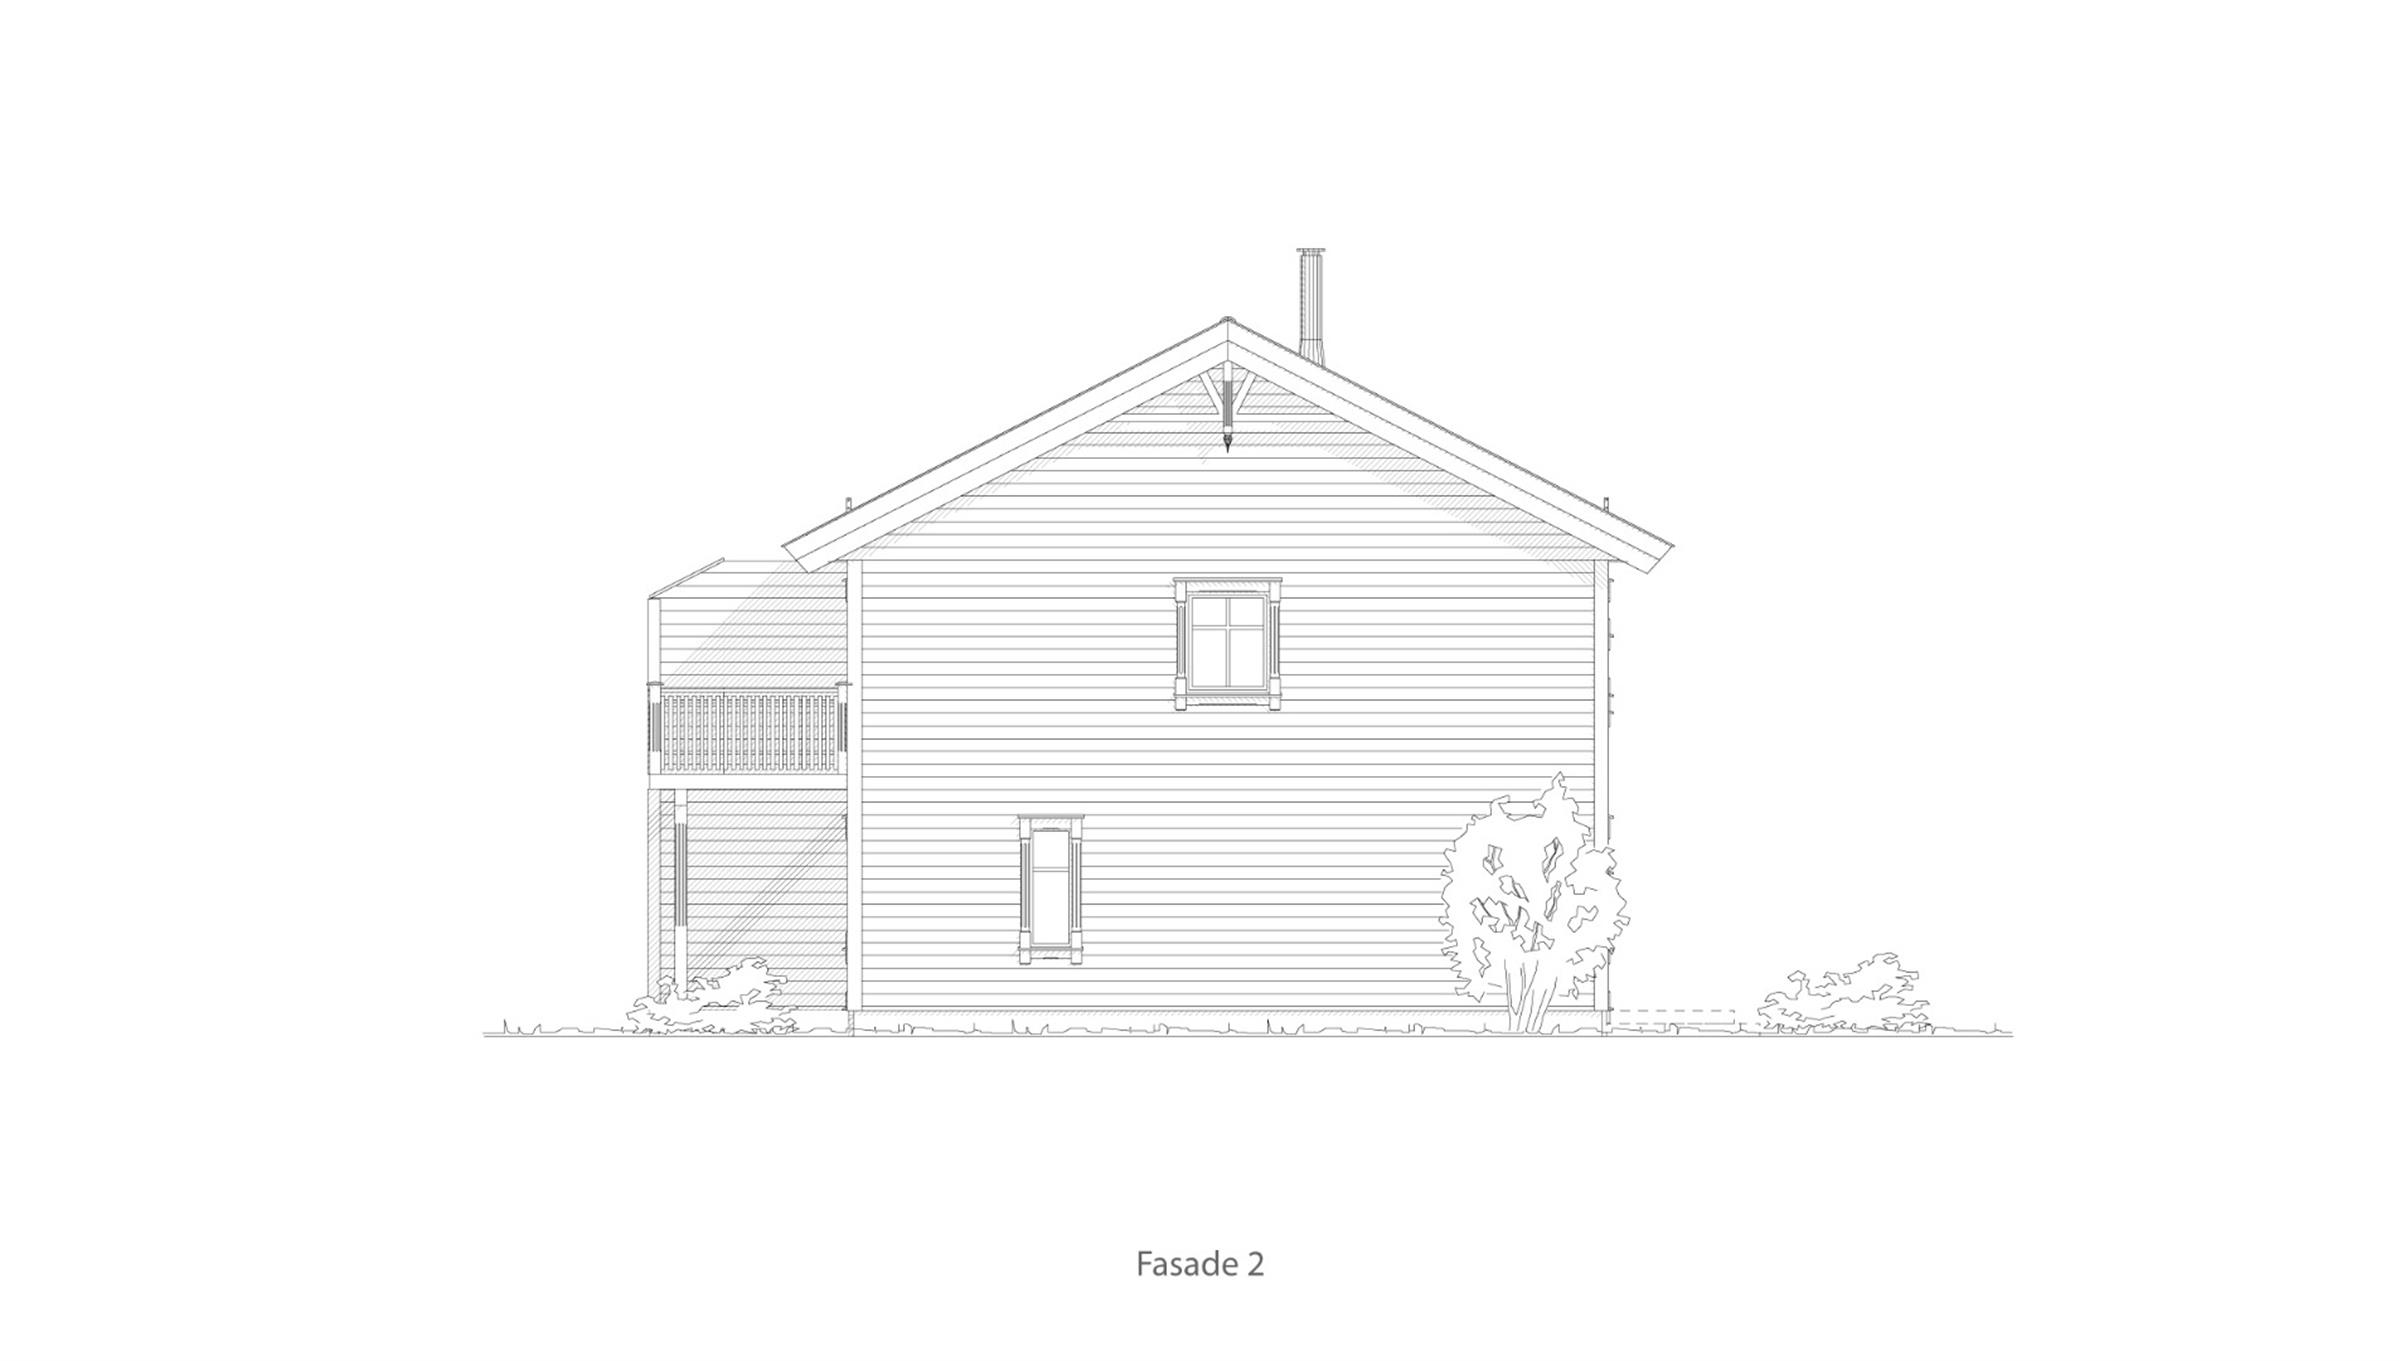 Hamar fasade 2